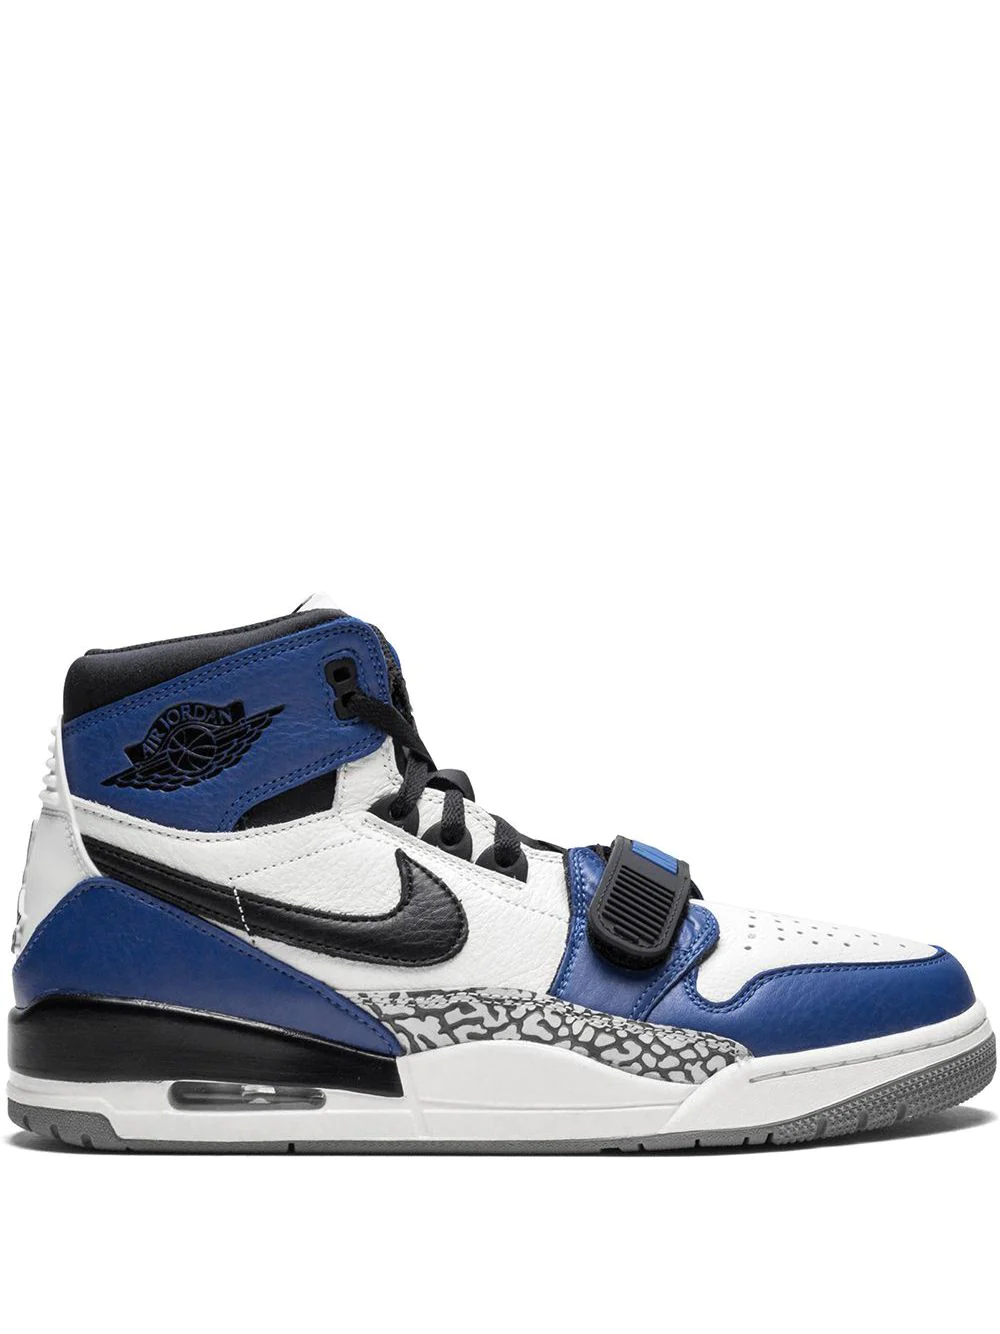 Jordan | Jordan кроссовки Air Jordan Legacy 312 | Clouty